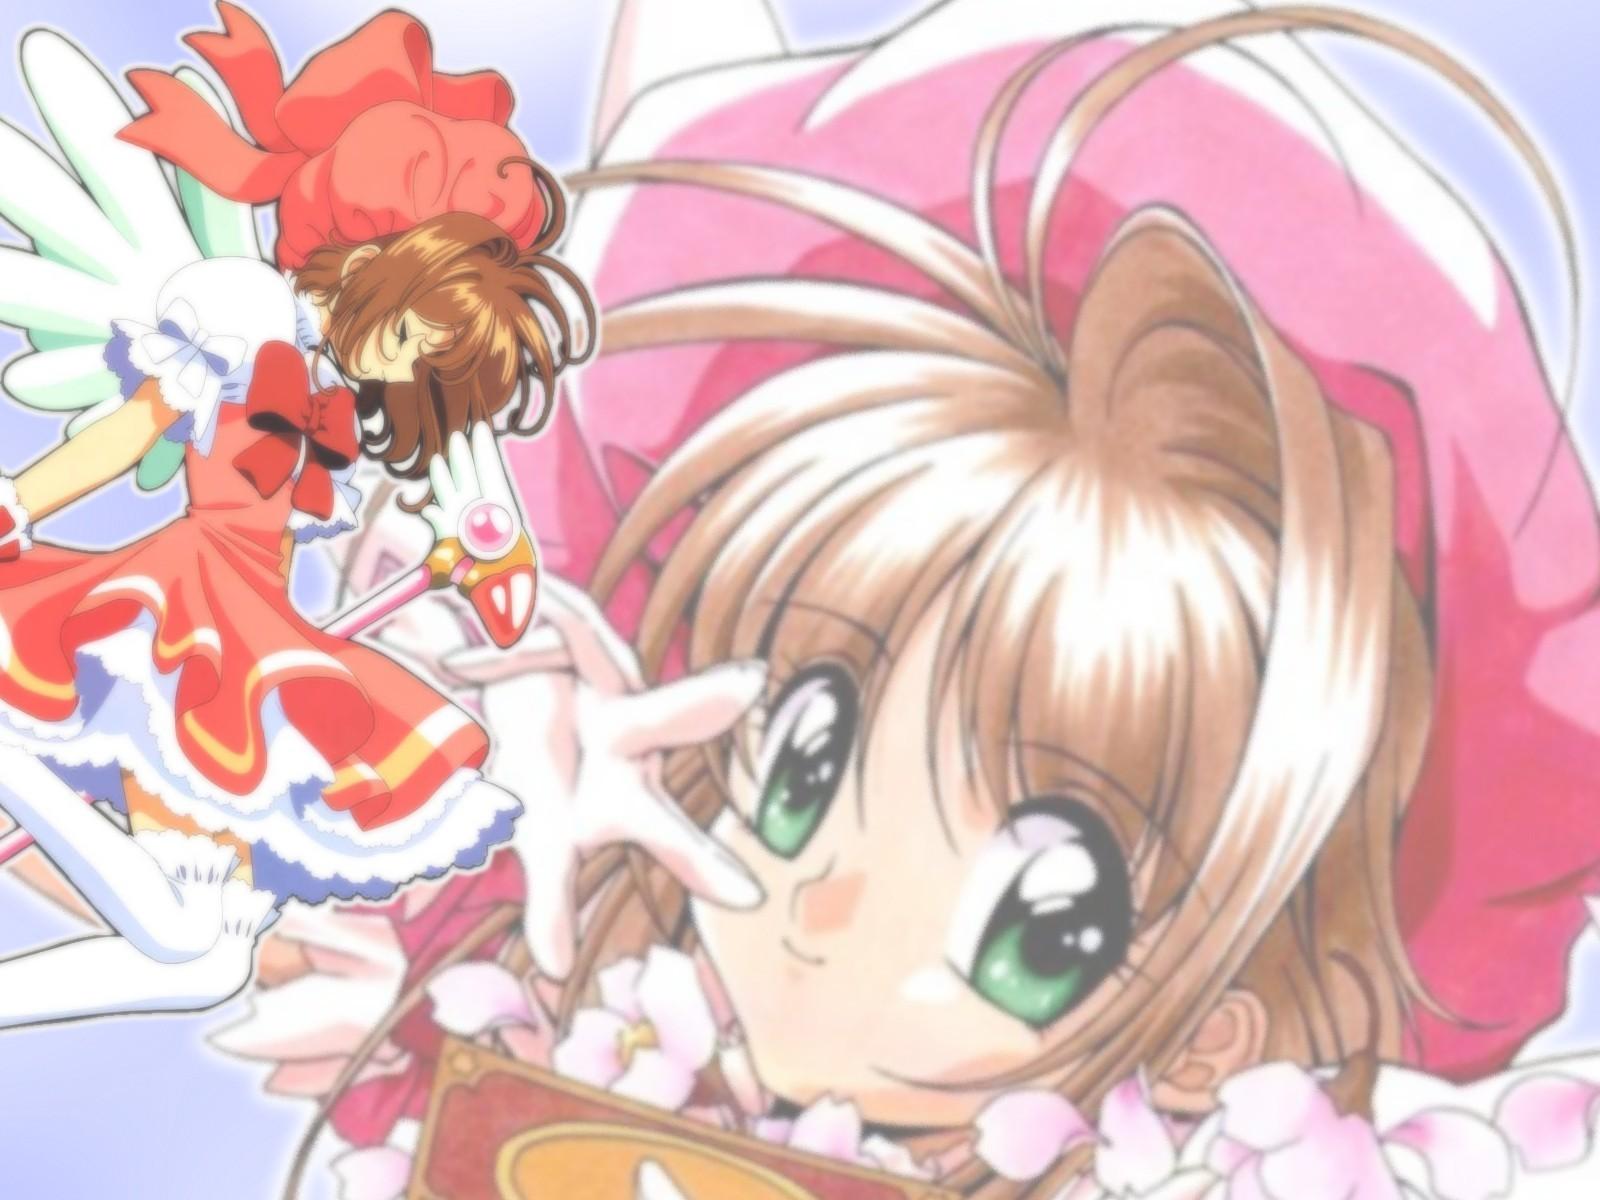 Cute Ultraman Wallpaper Sakura Cardcaptor Sakura Wallpaper 5360600 Fanpop